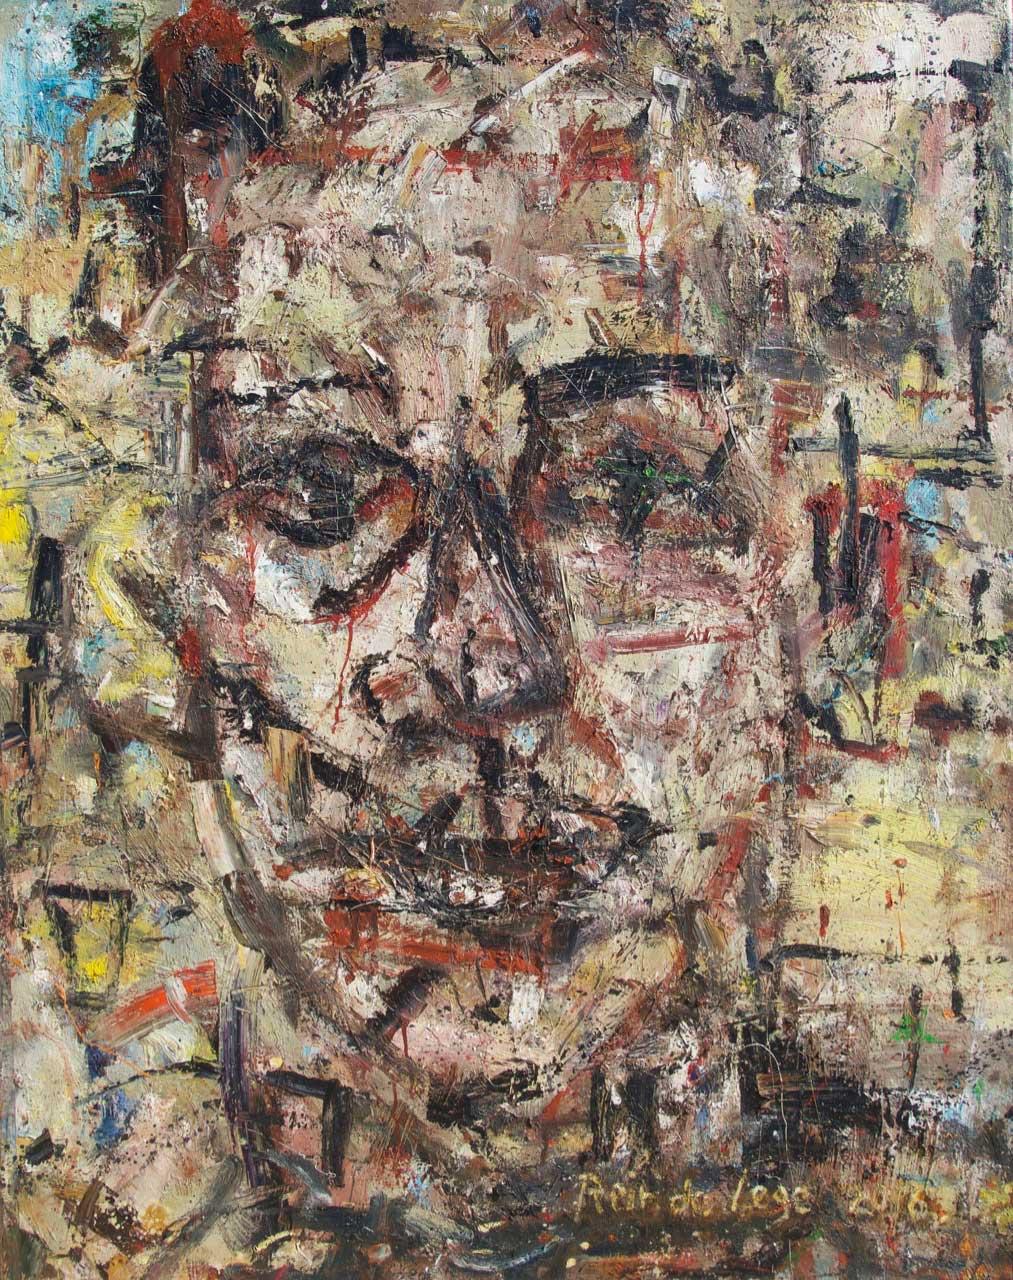 2016 Oil on canvas 130/97 cm.